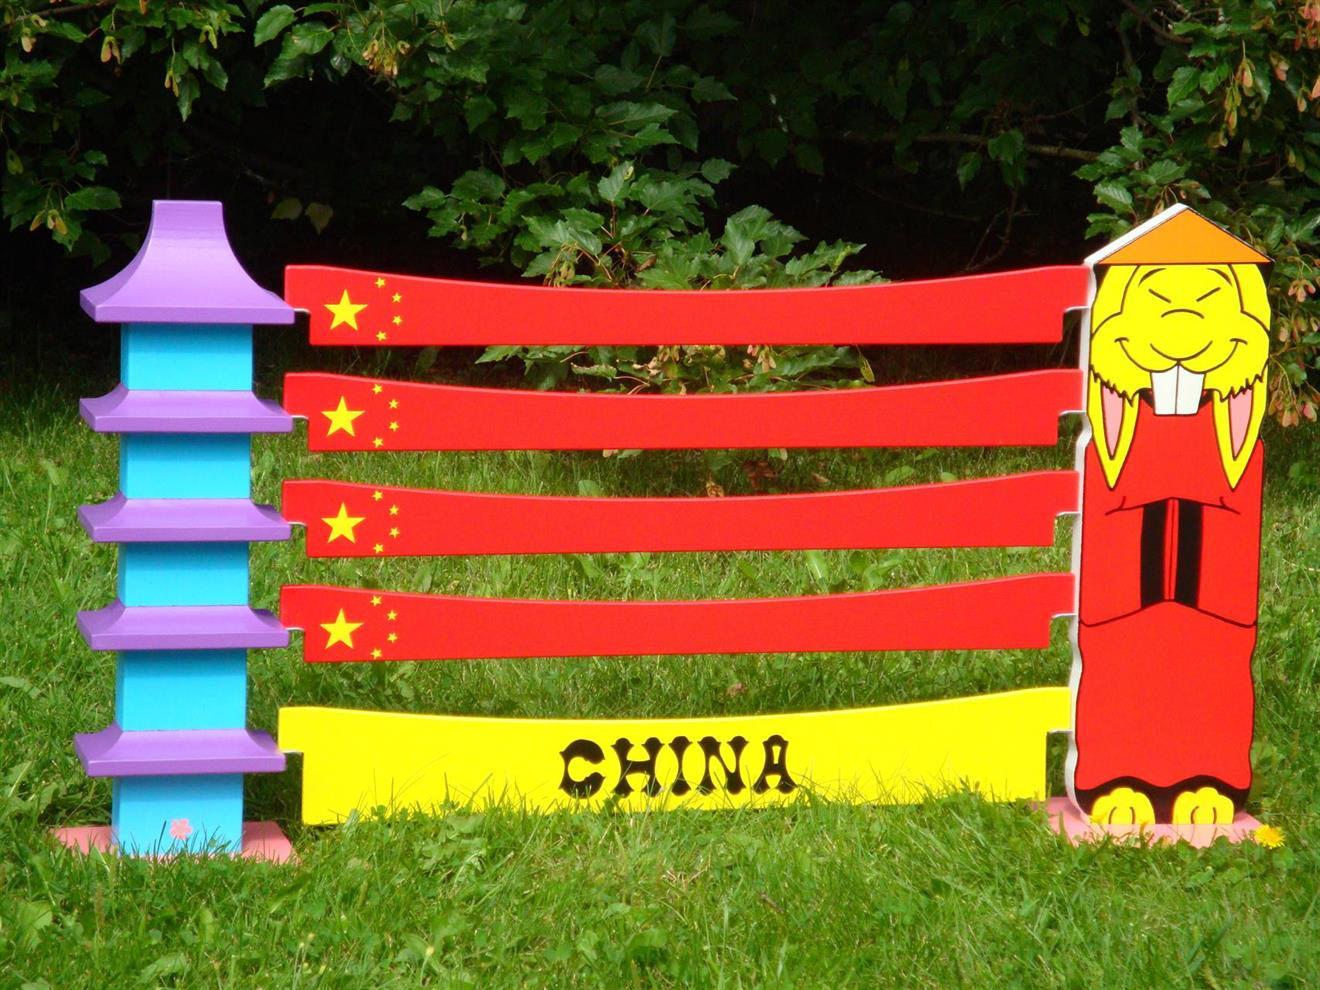 Kina enkel, hus med röd kines